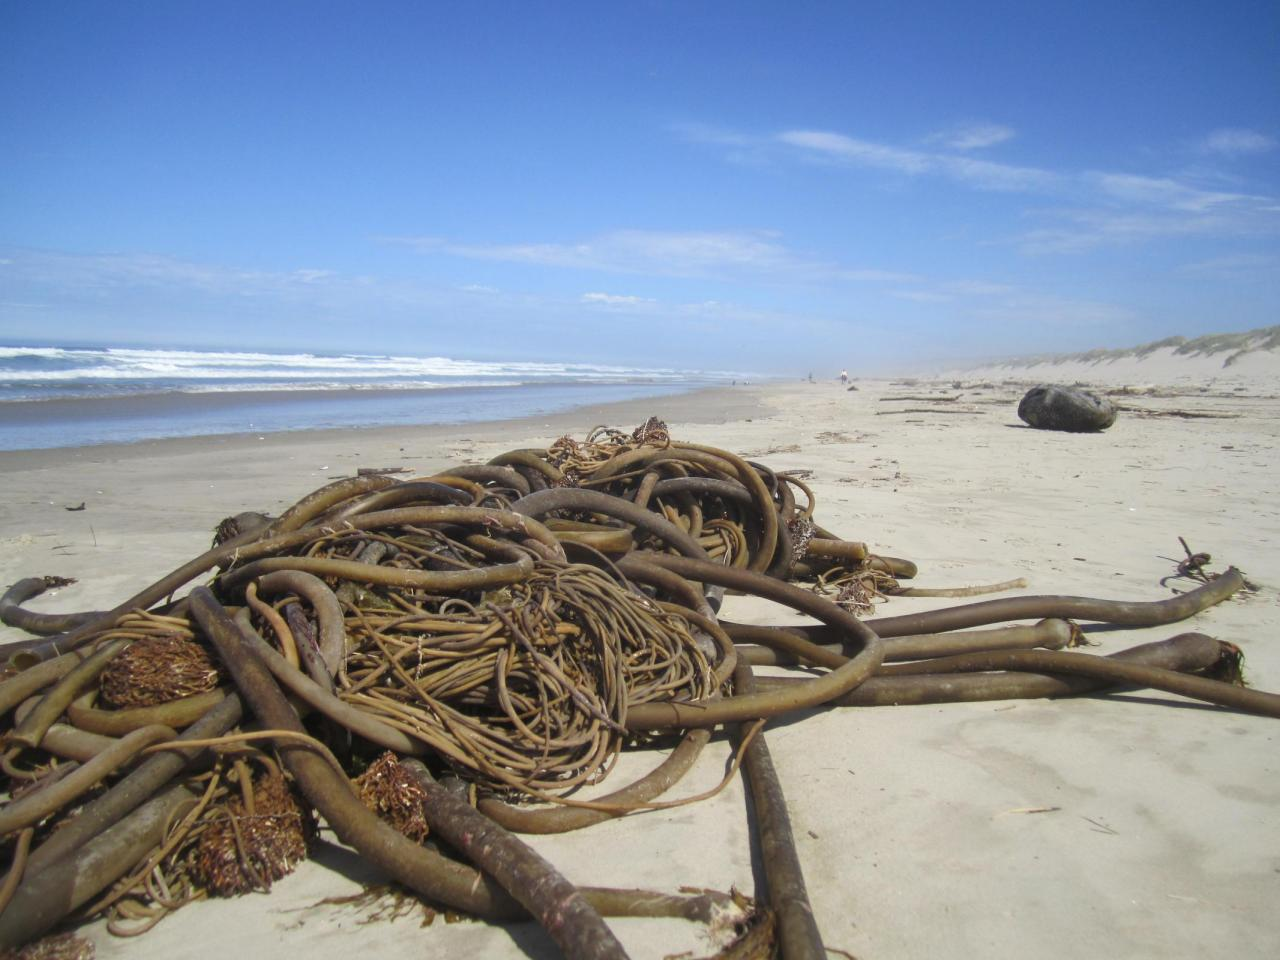 Wad of kelp